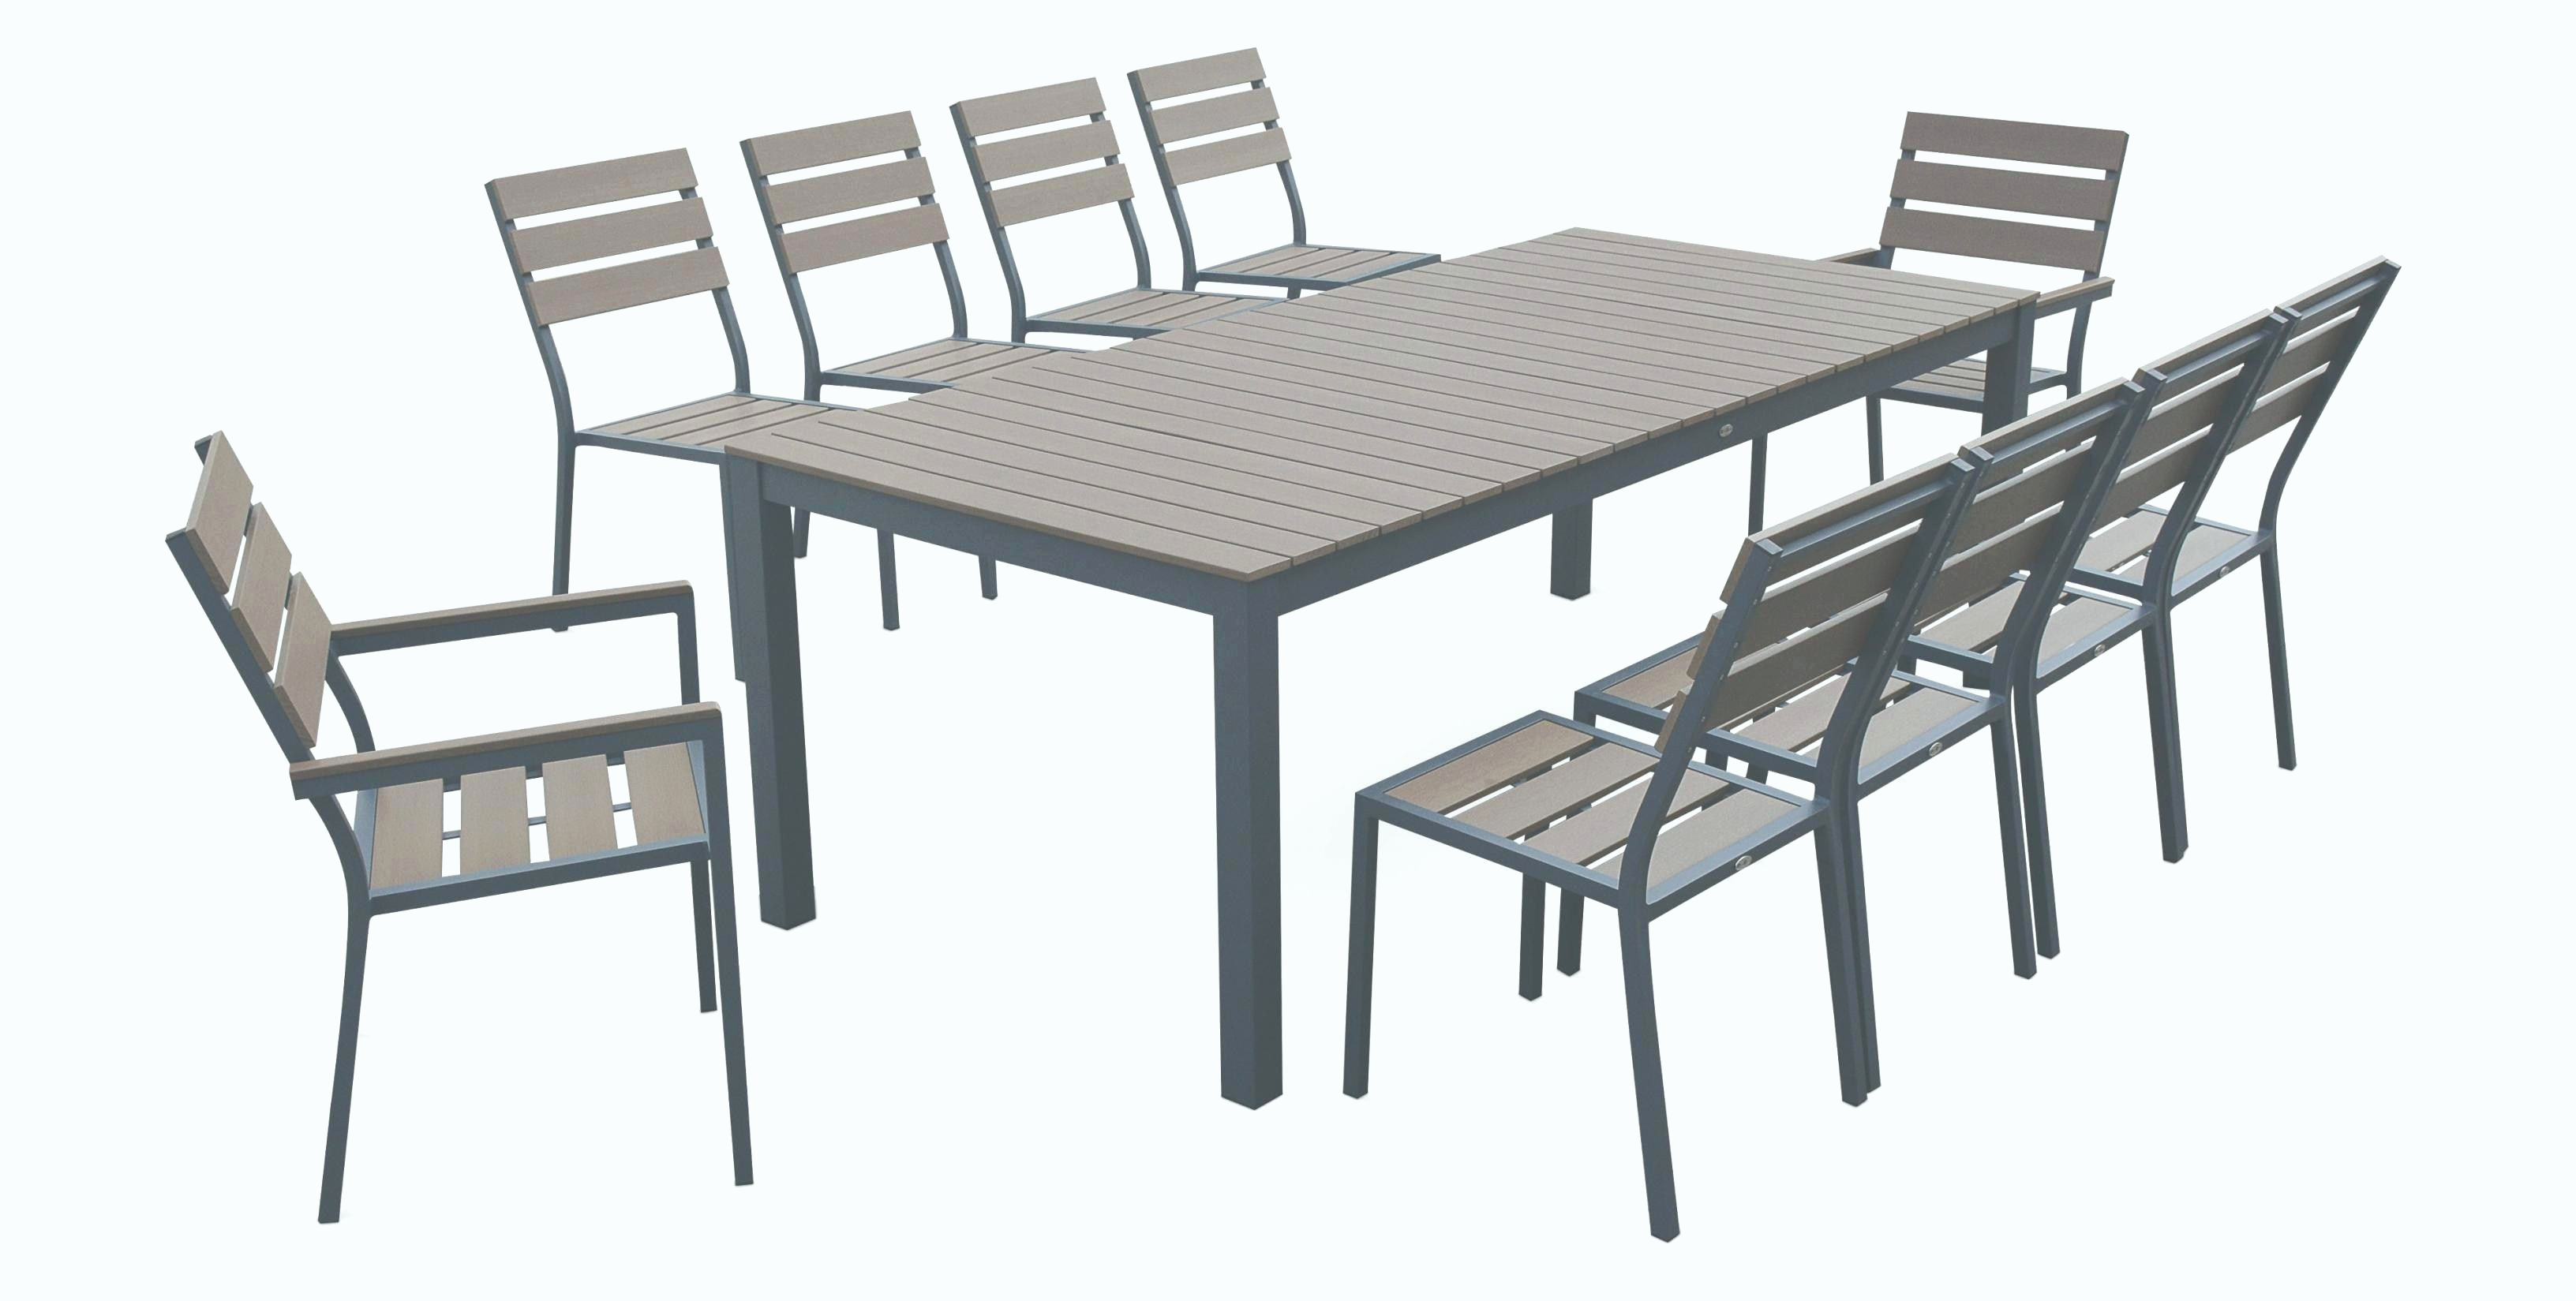 Table Salon Conforama Inspirant Image Fauteuil De Table Scandinave ...